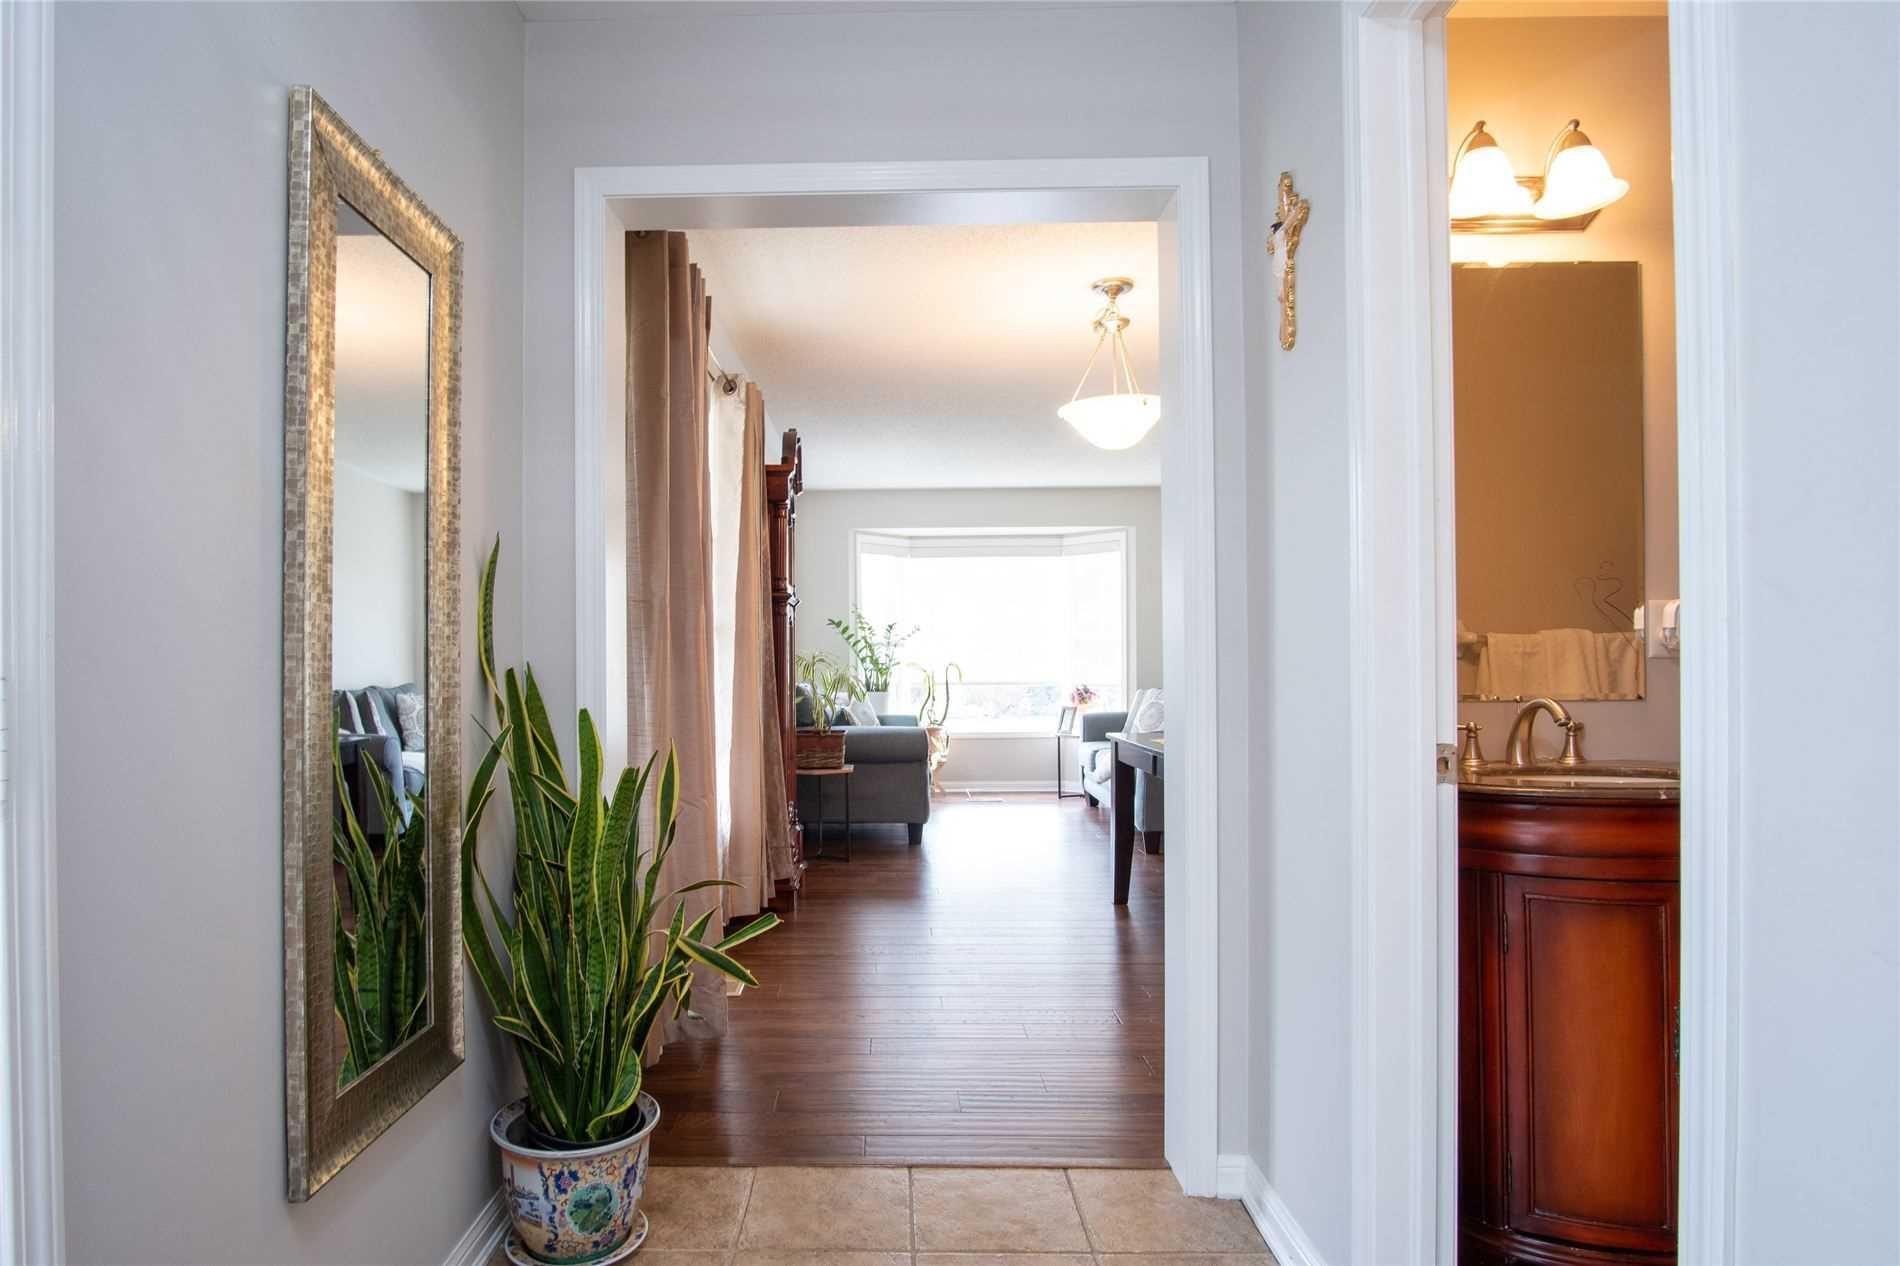 827 Biggar Hts - Coates Detached for sale, 4 Bedrooms (W5400280) - #5